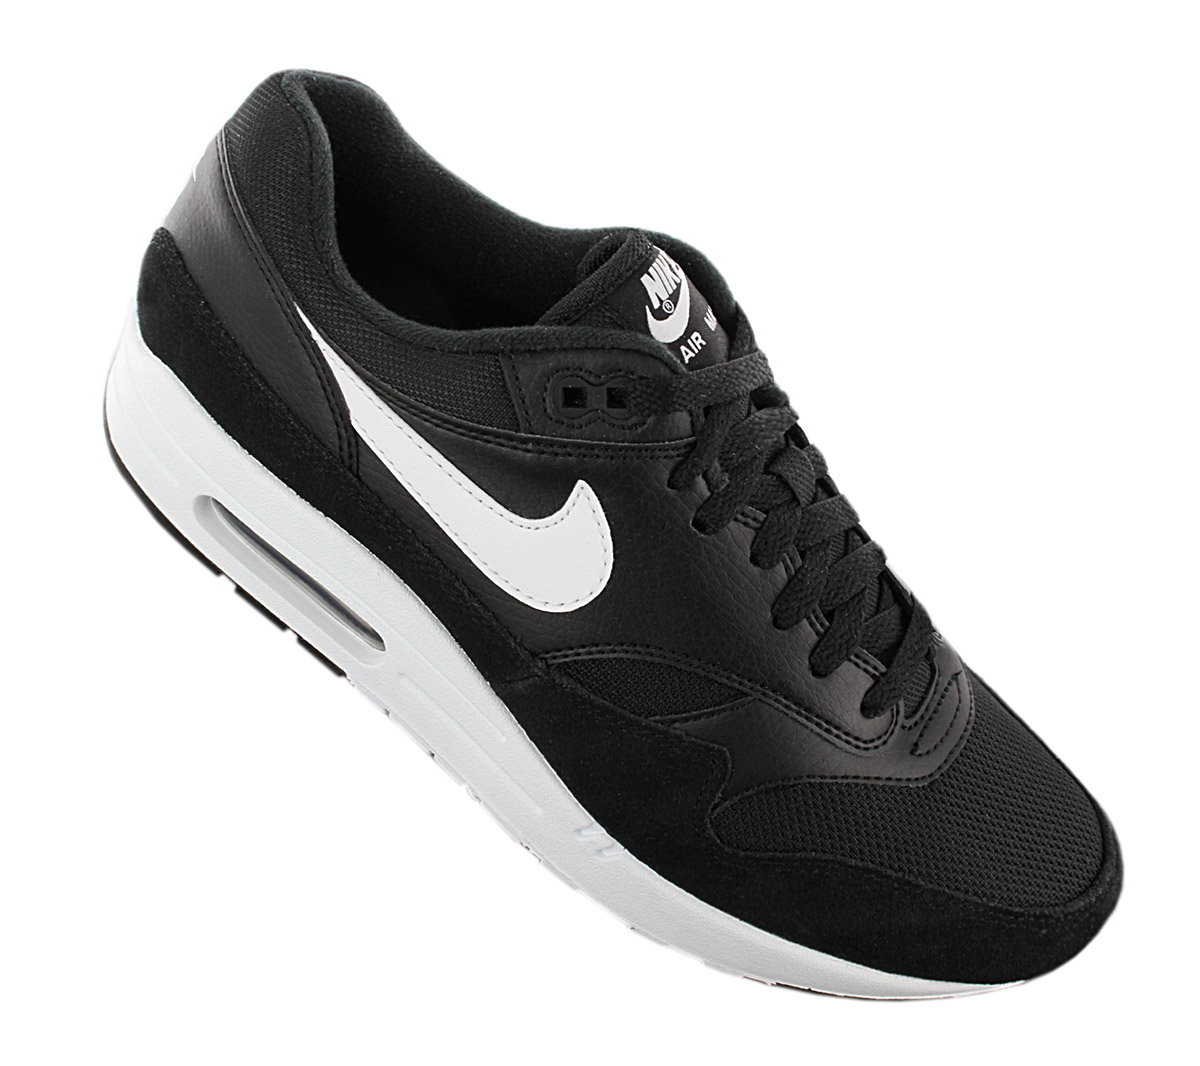 Details zu Nike Air Max 1 Herren Sneaker AH8145 014 Schwarz Schuhe Fashion Turnschuhe NEU